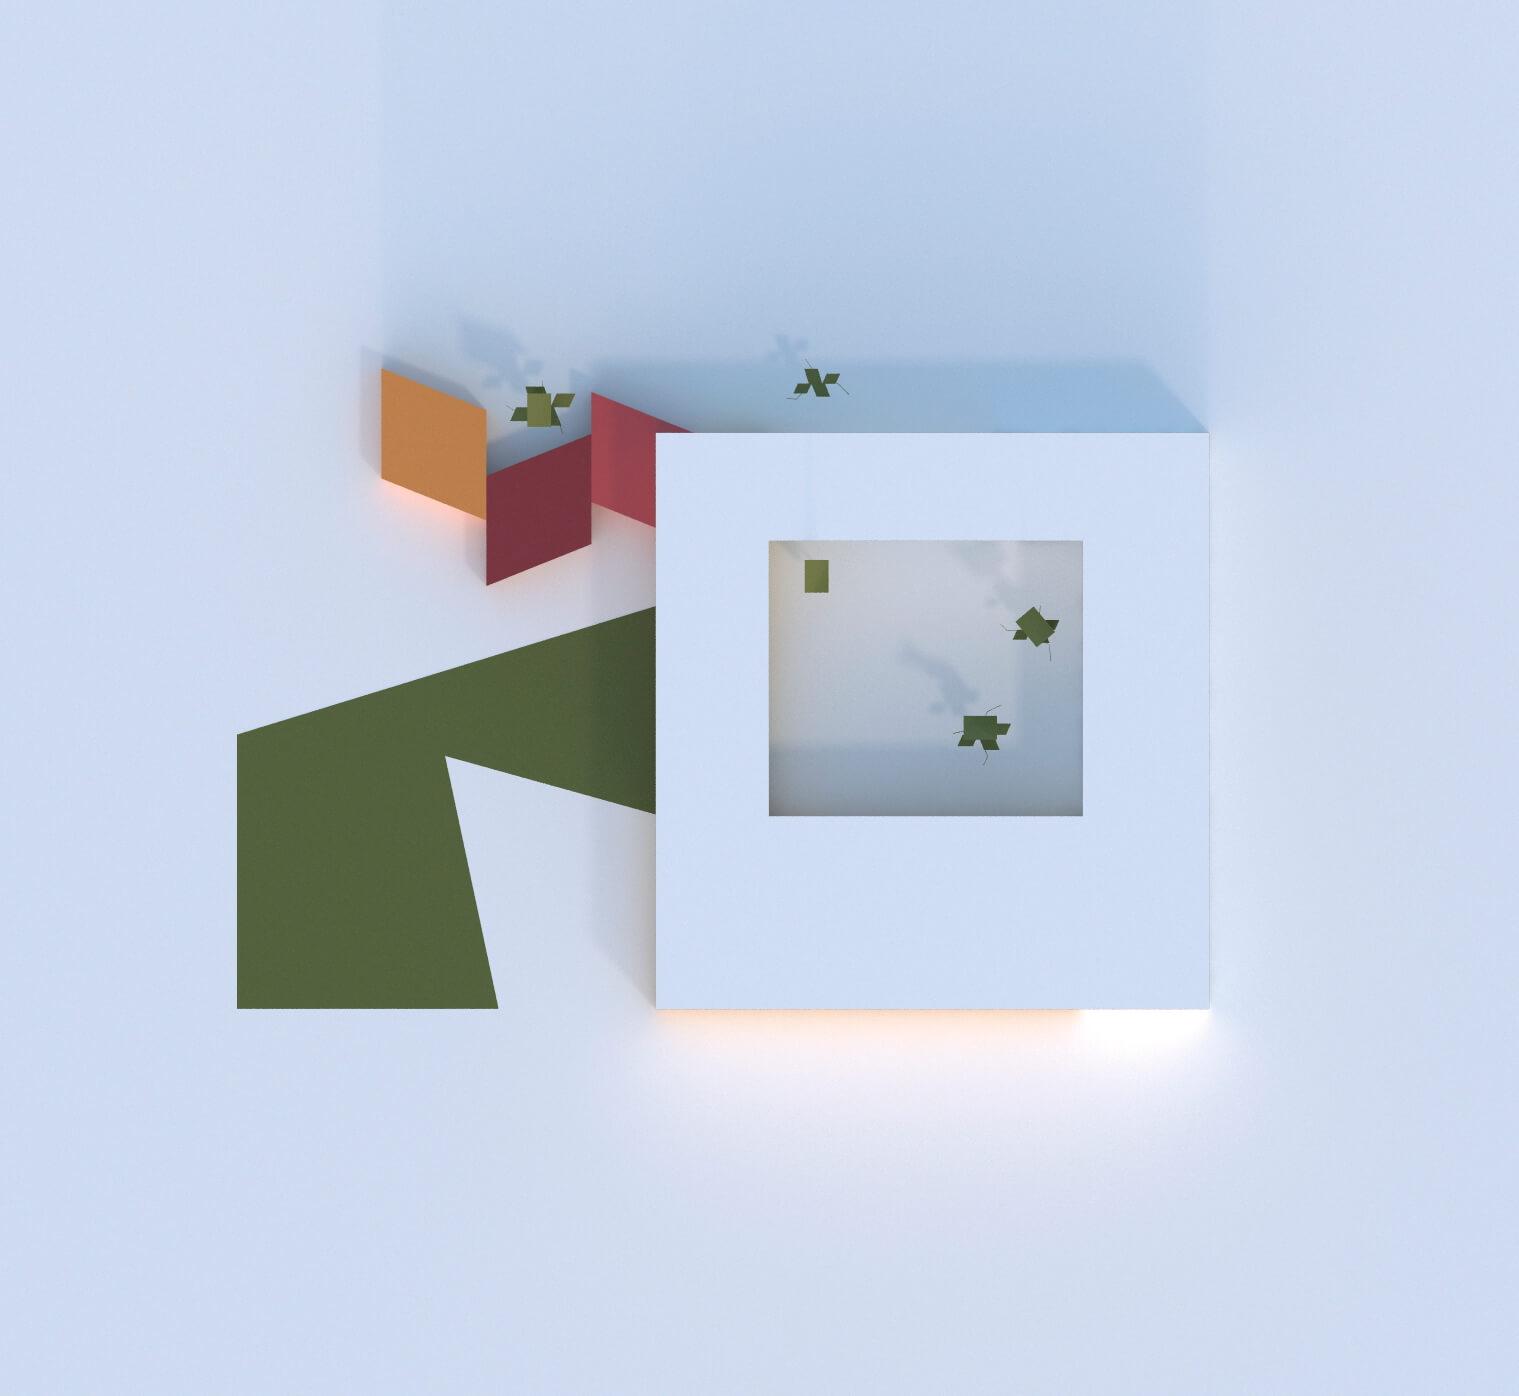 planell-hirsch_concurso_arquitectura_alemania 1